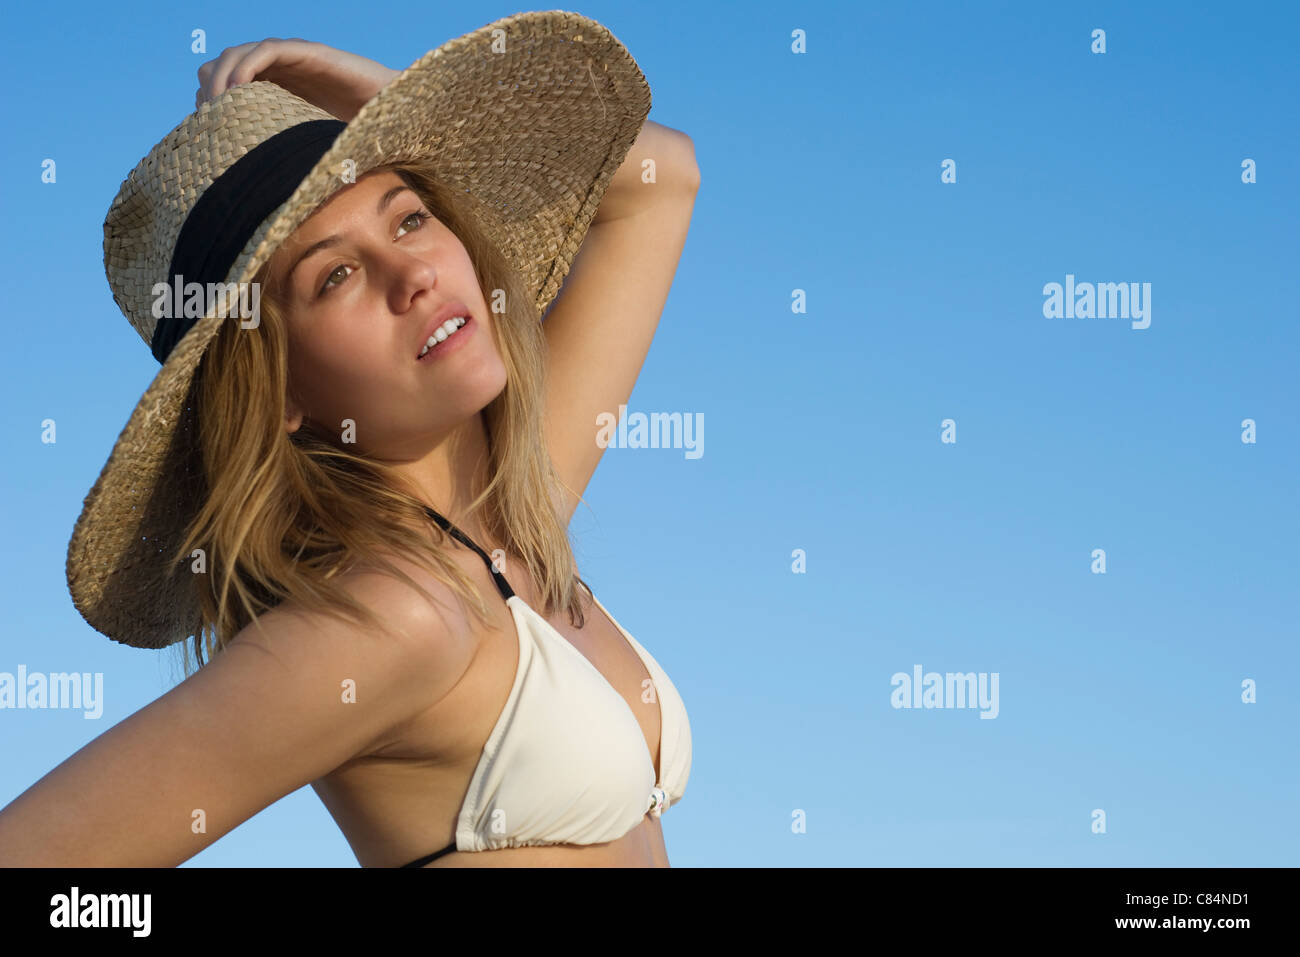 Woman wearing bikini and sun hat looking away dreamily, portrait - Stock Image